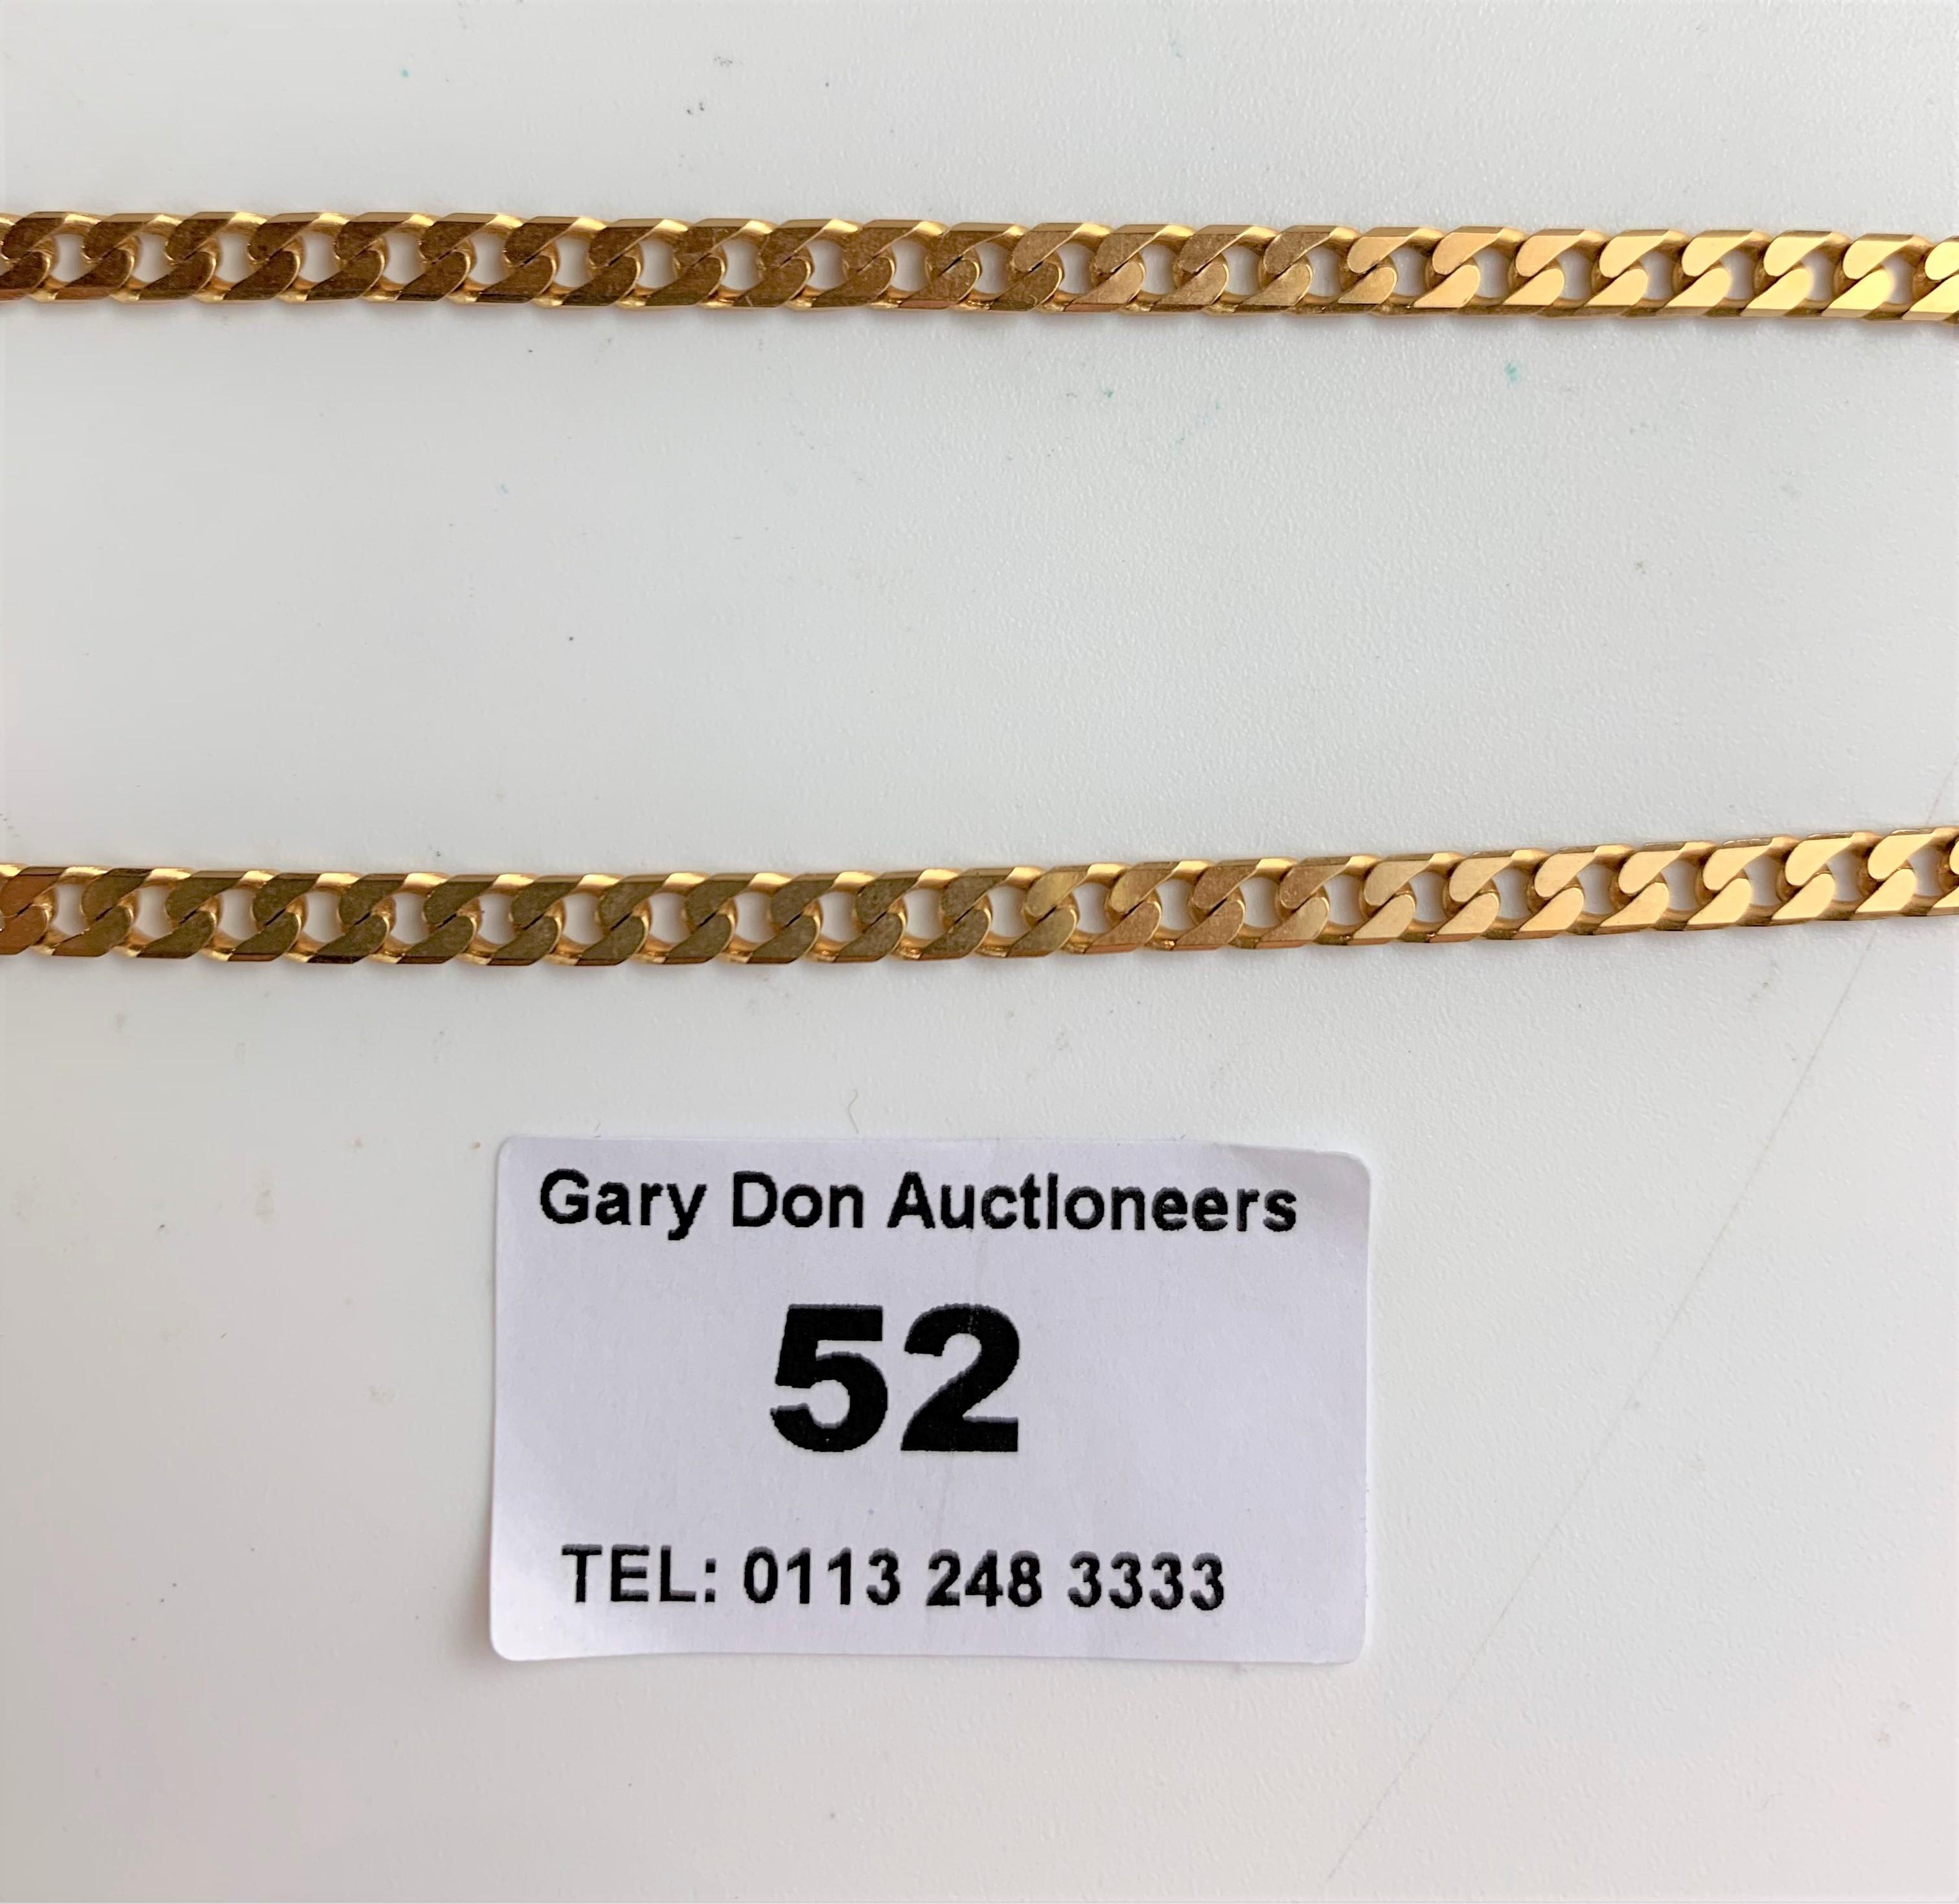 "9k gold necklace, length 18"", w: 12 gms - Image 4 of 4"